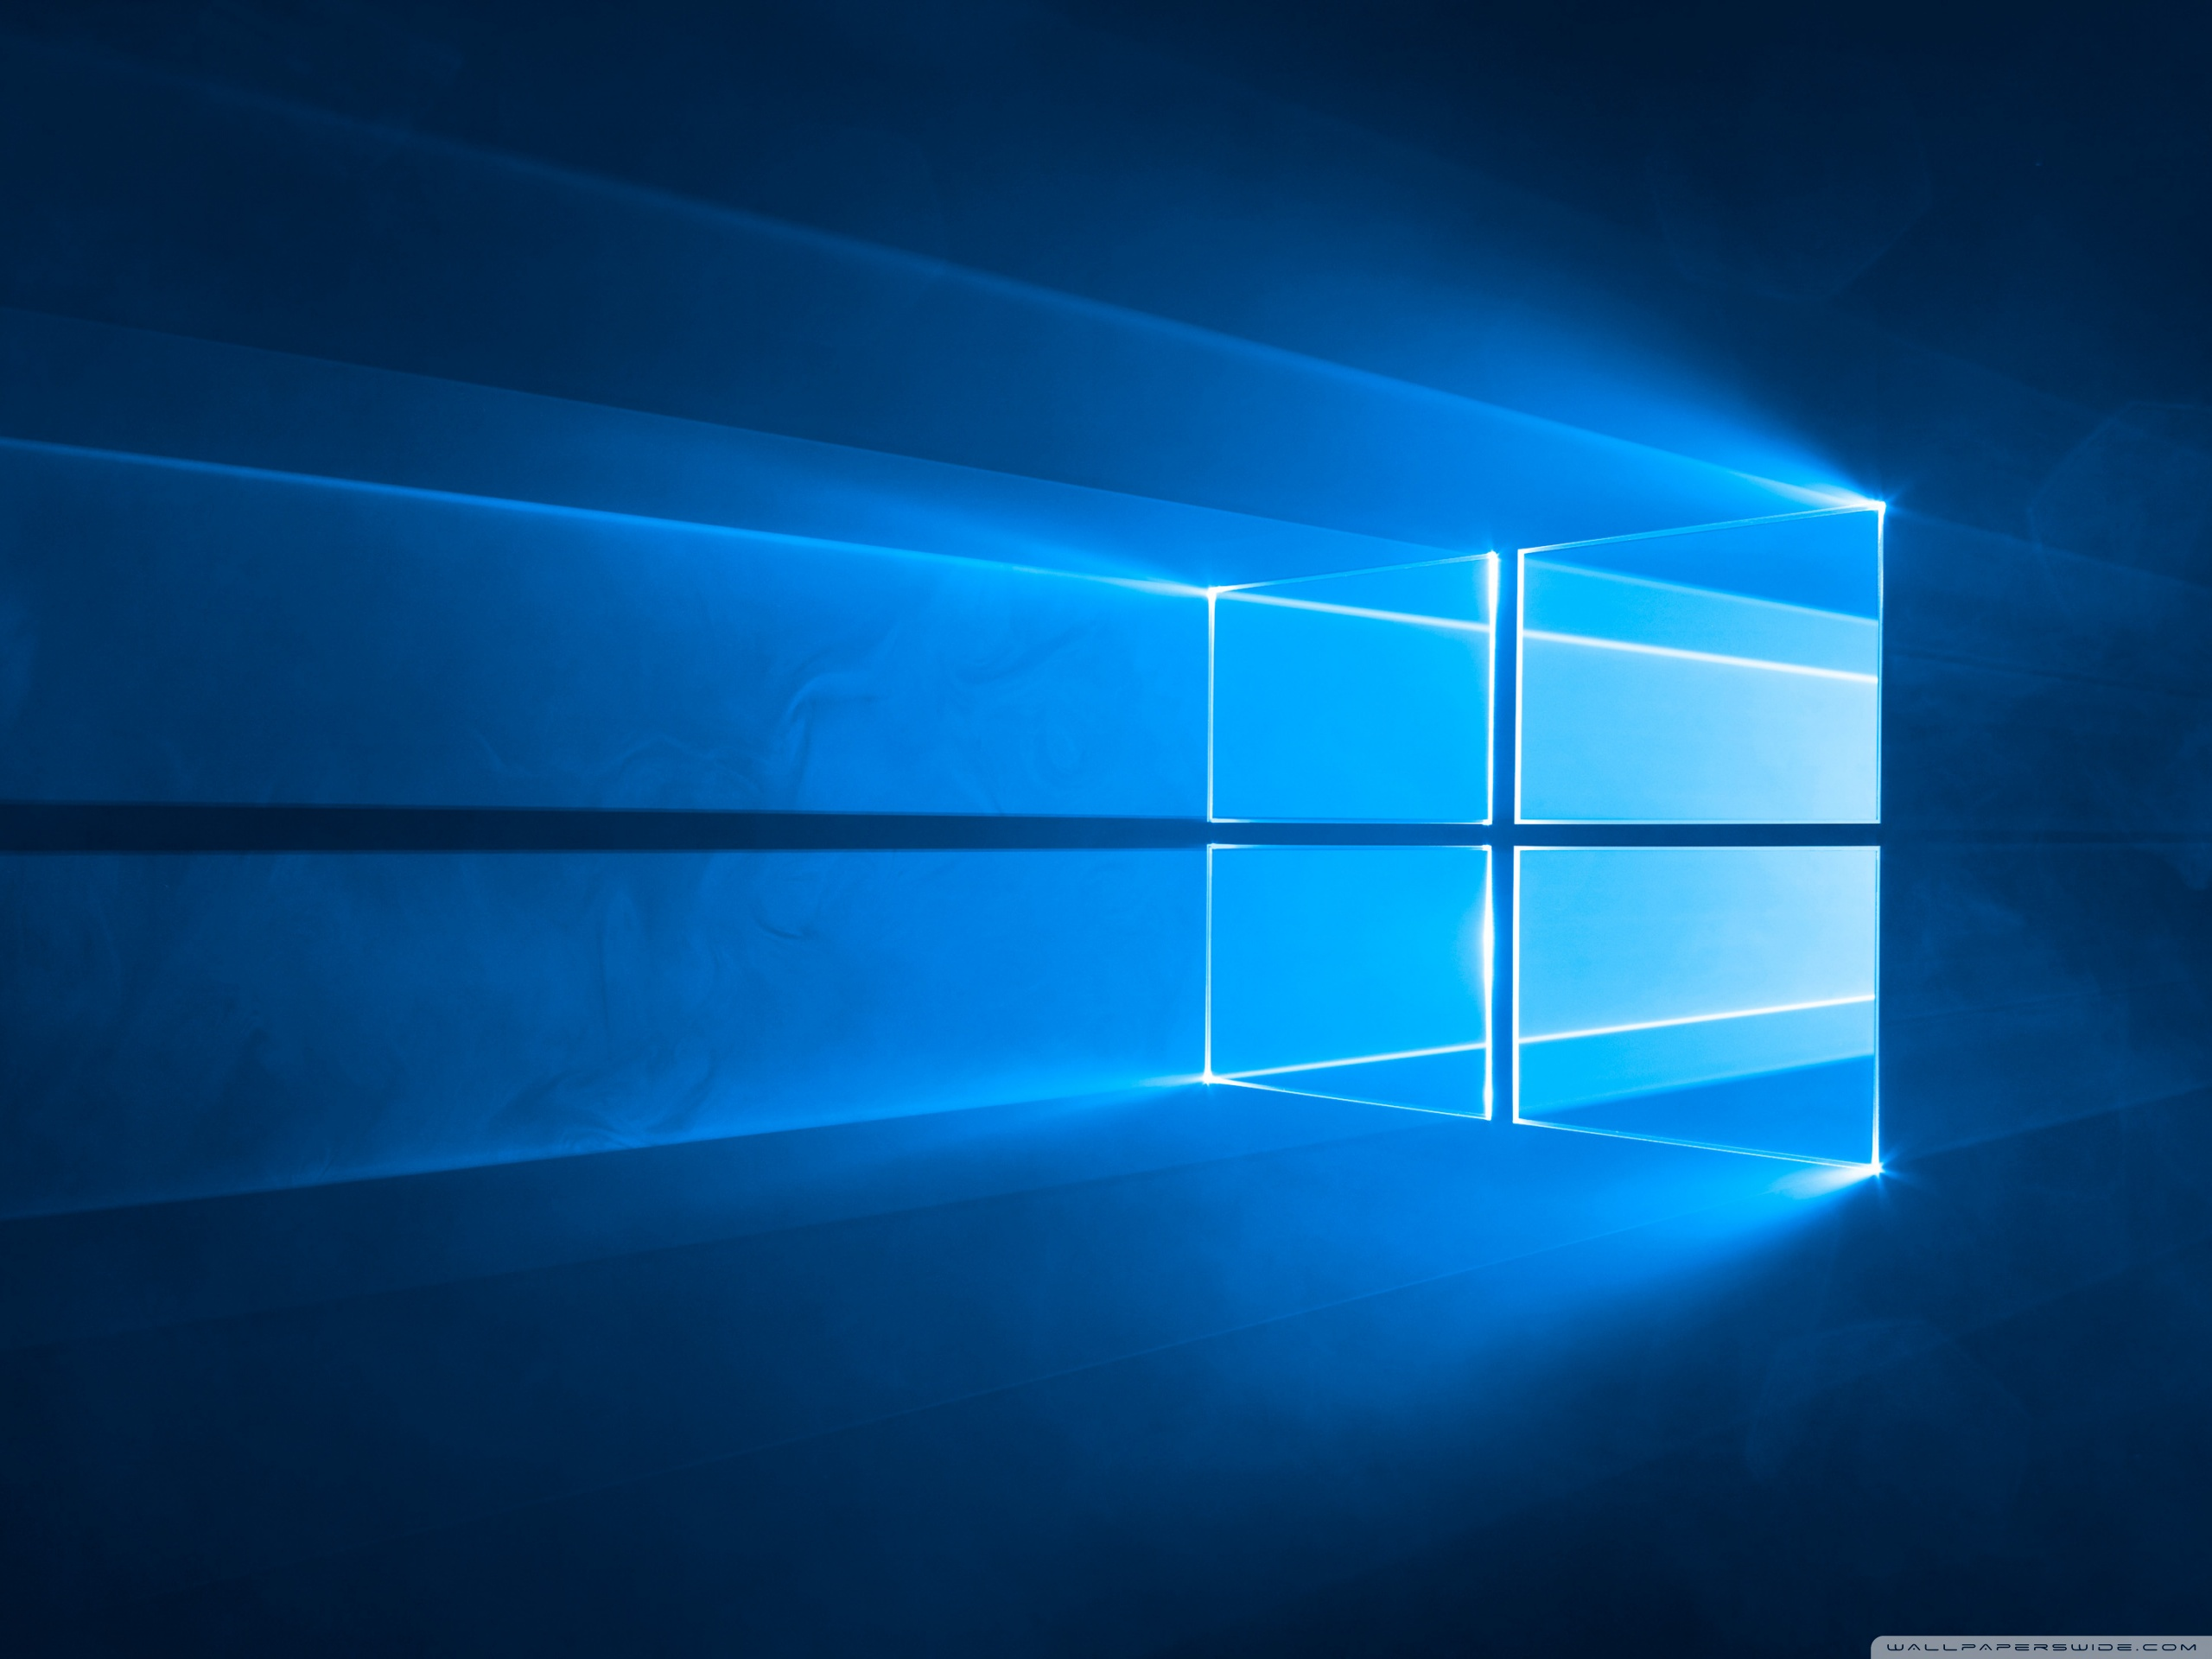 Download Windows 10 Hero 4K Wallpaper   Wallpapers Printed 2560x1920